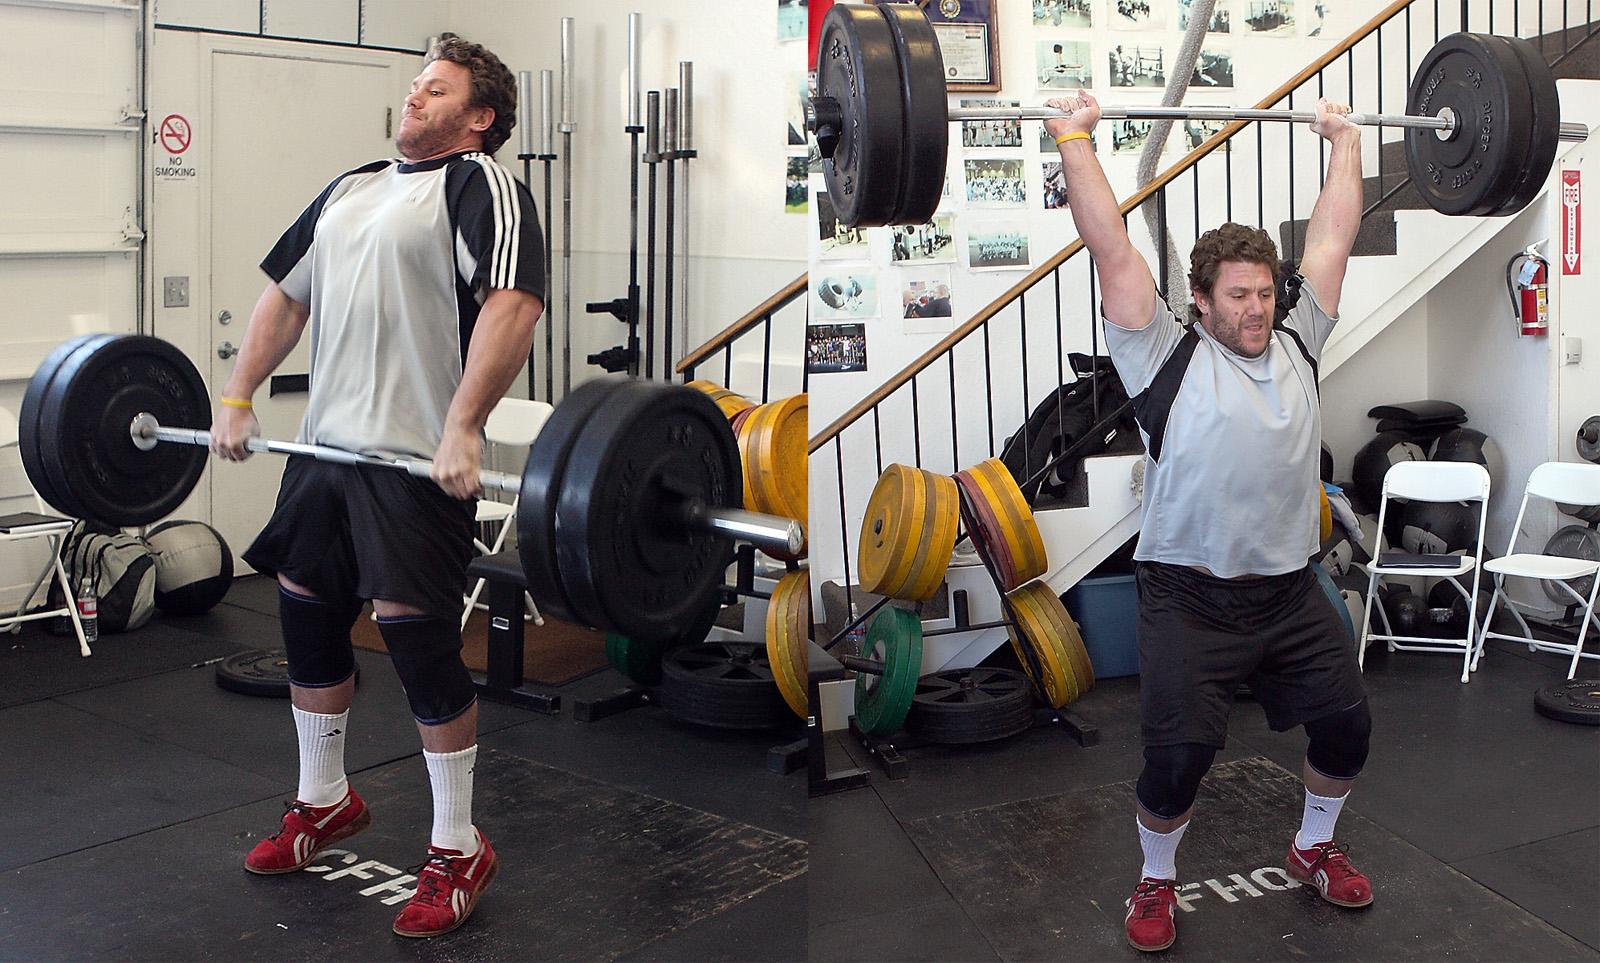 Dylanlucas pumped up trainer bonks student at r